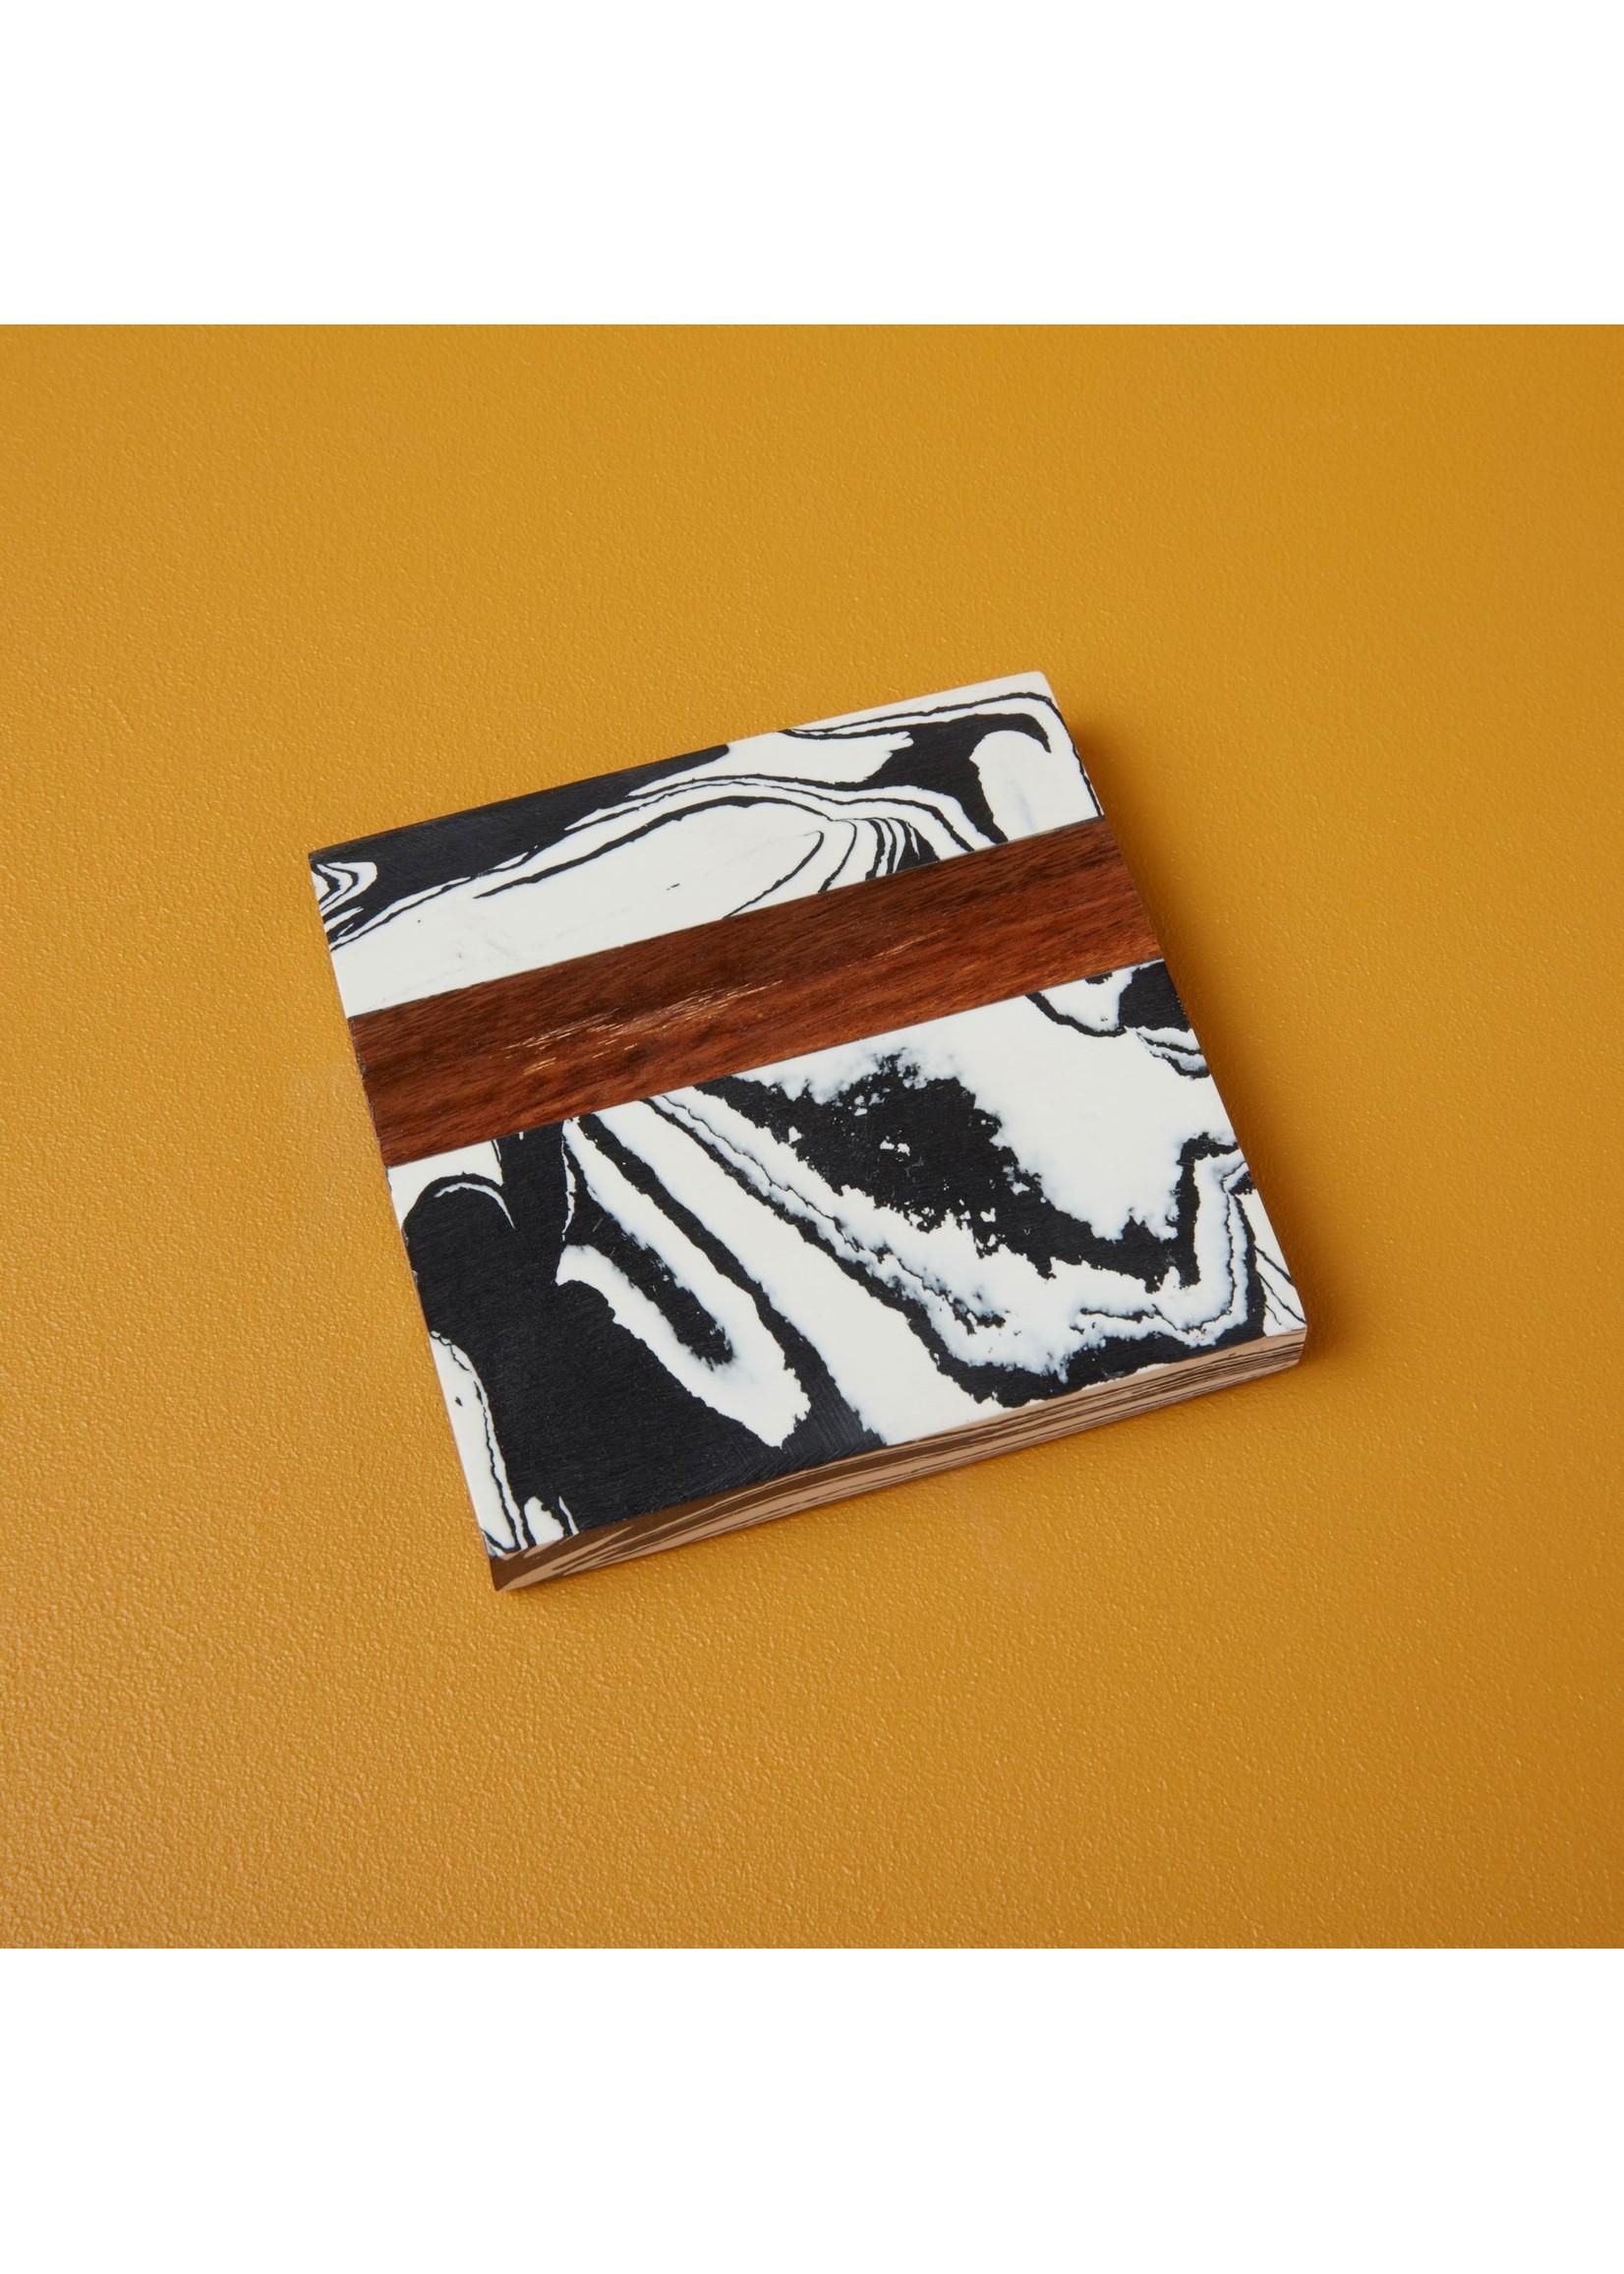 Zebra Marble & Wood Coaster